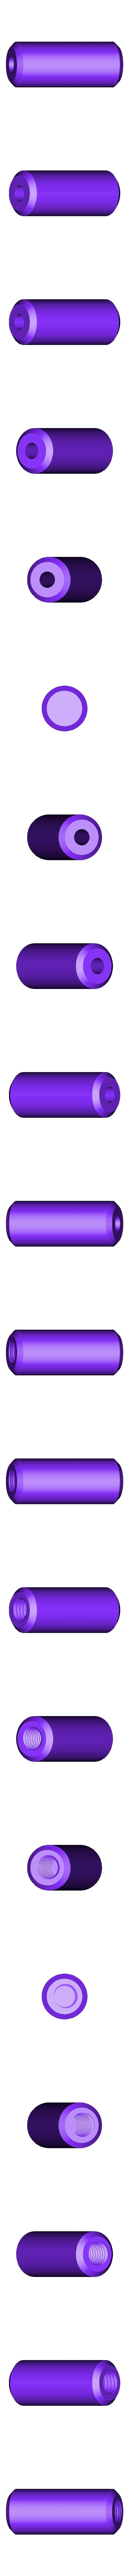 motor-shaft_connection.stl Download STL file Water Jet Propulsion System • 3D print template, janikabalin